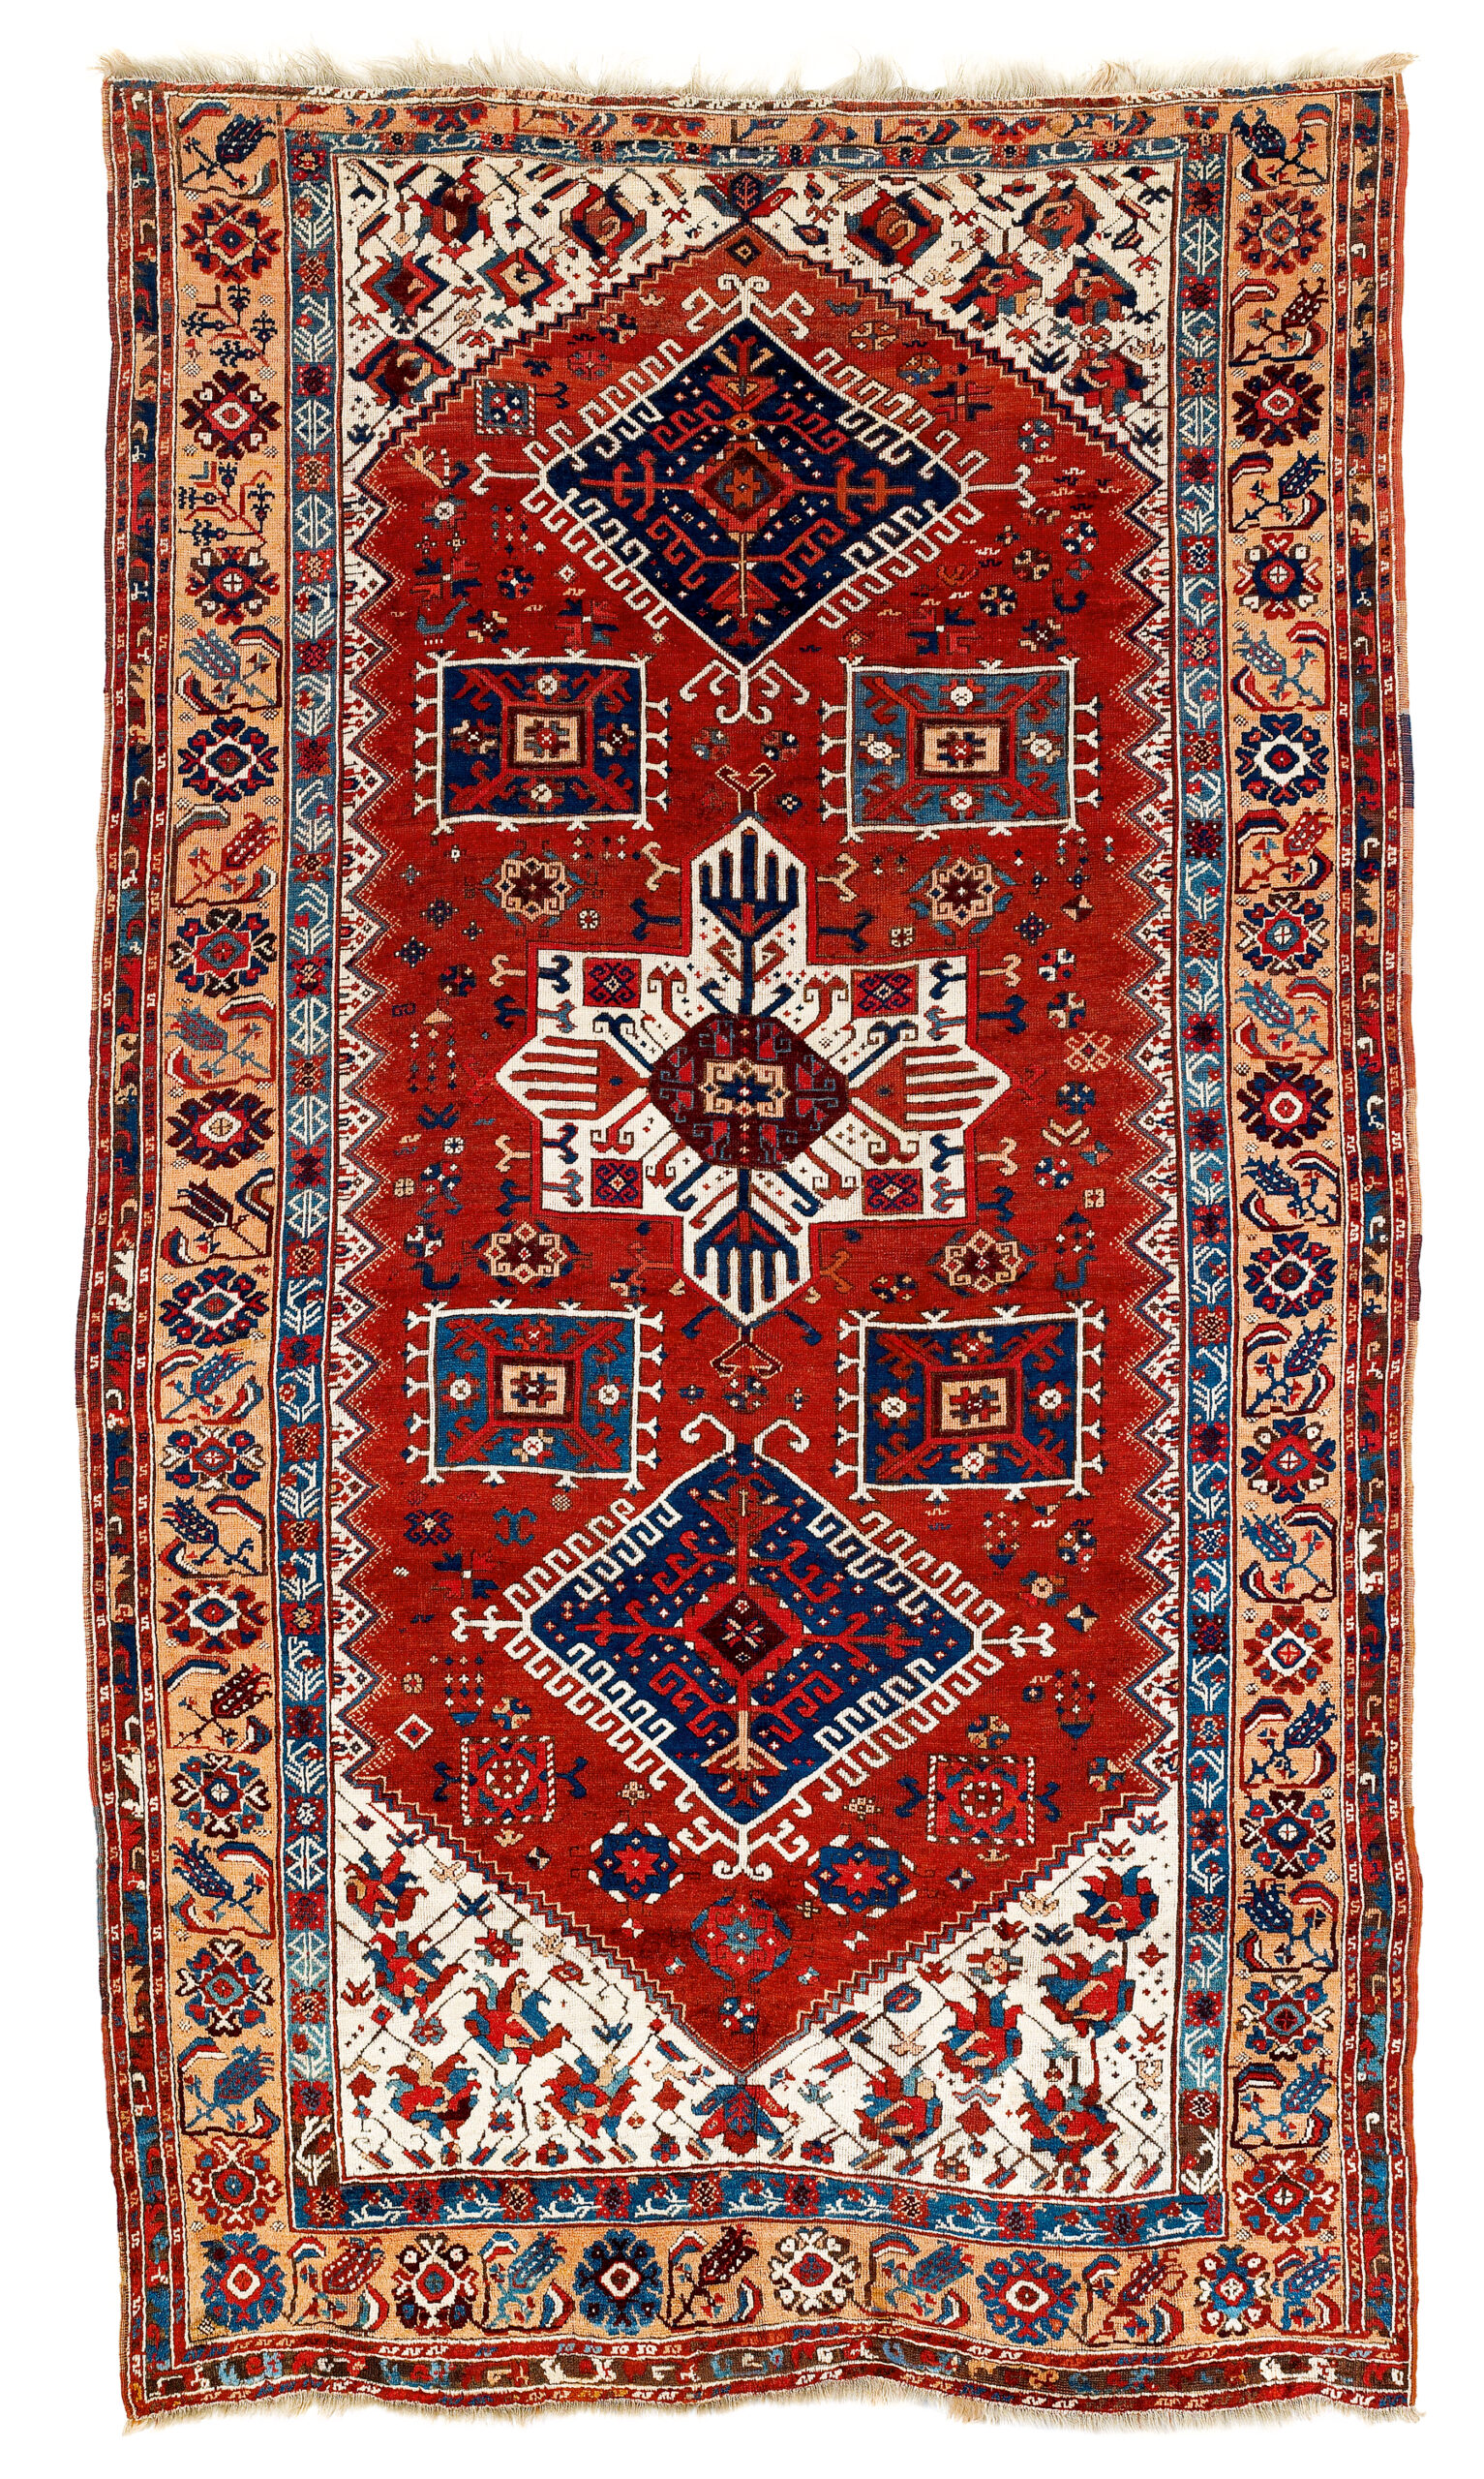 Antique 18th Century Karaman workshop carpet, Central Anatolia